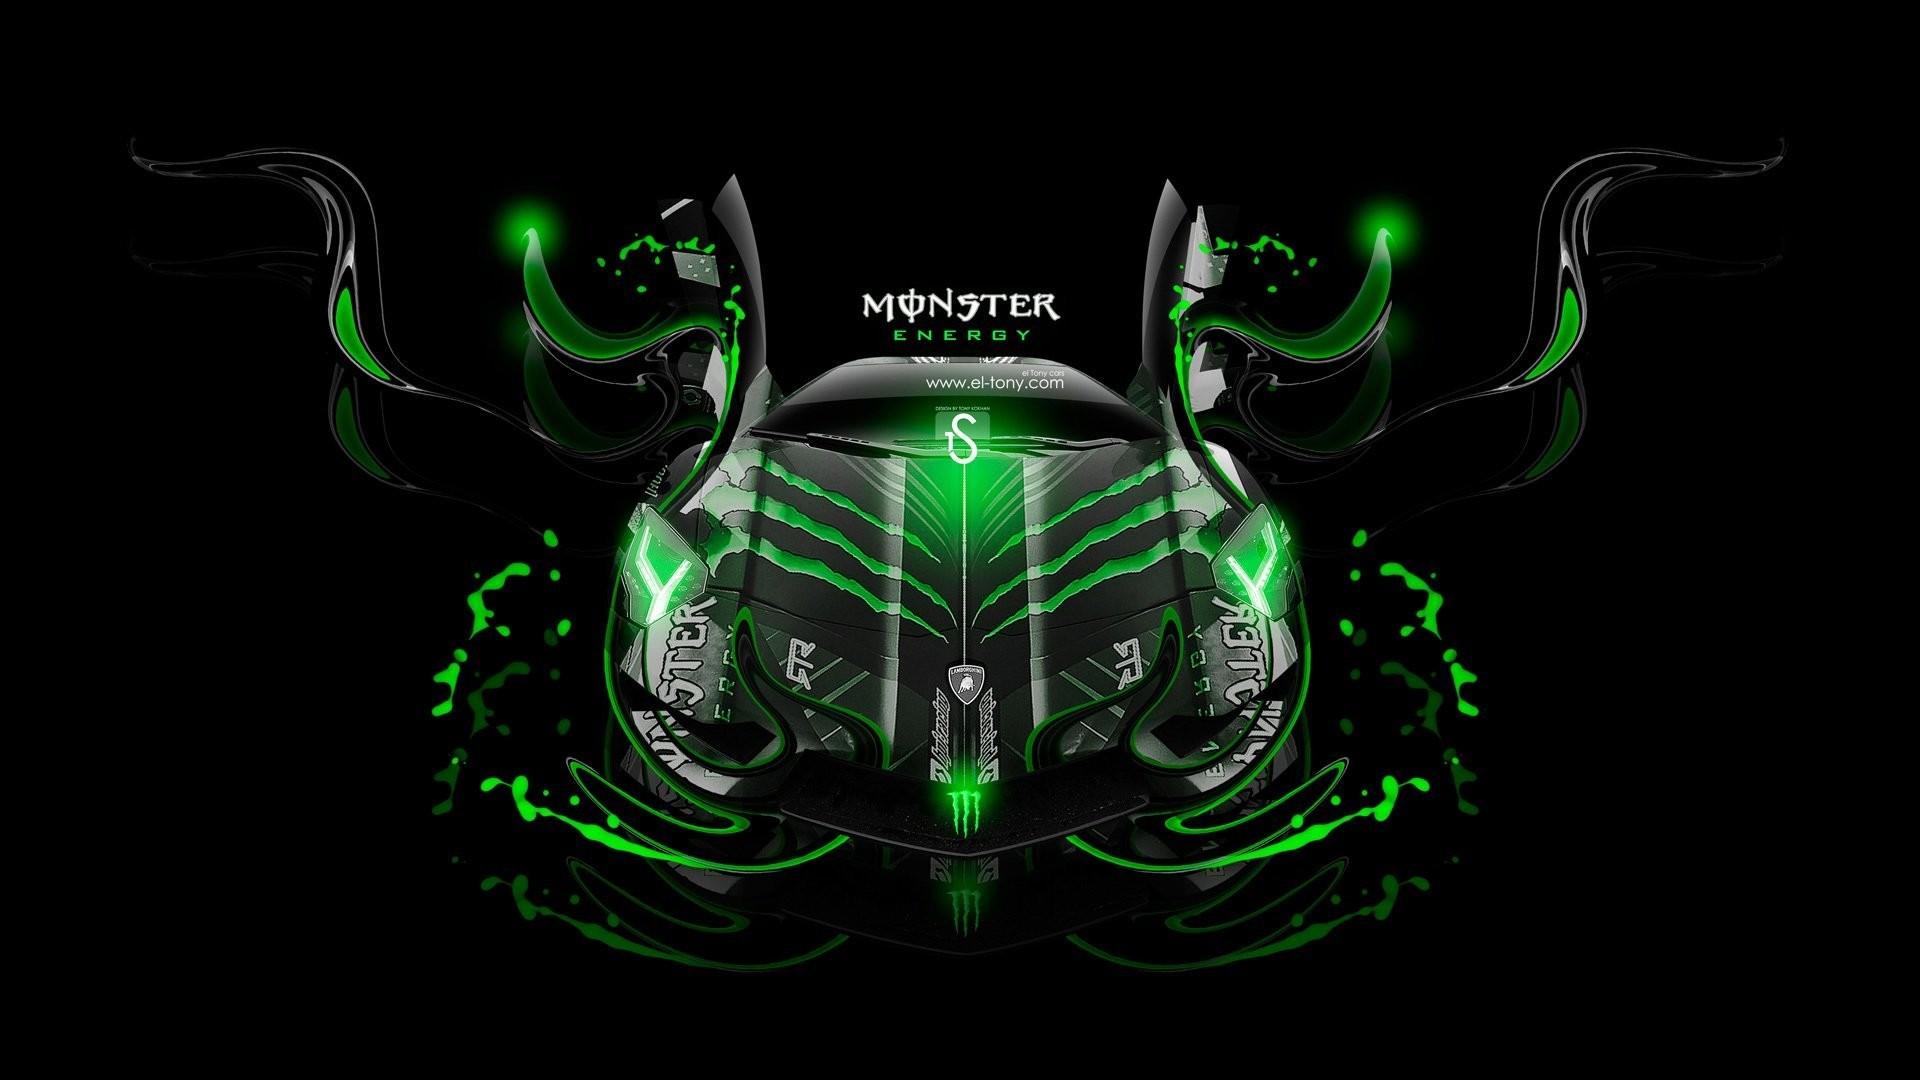 lamborghini aventador monster energy fantasy neon green el tony cars tony  kokhan design black lamborghini monster